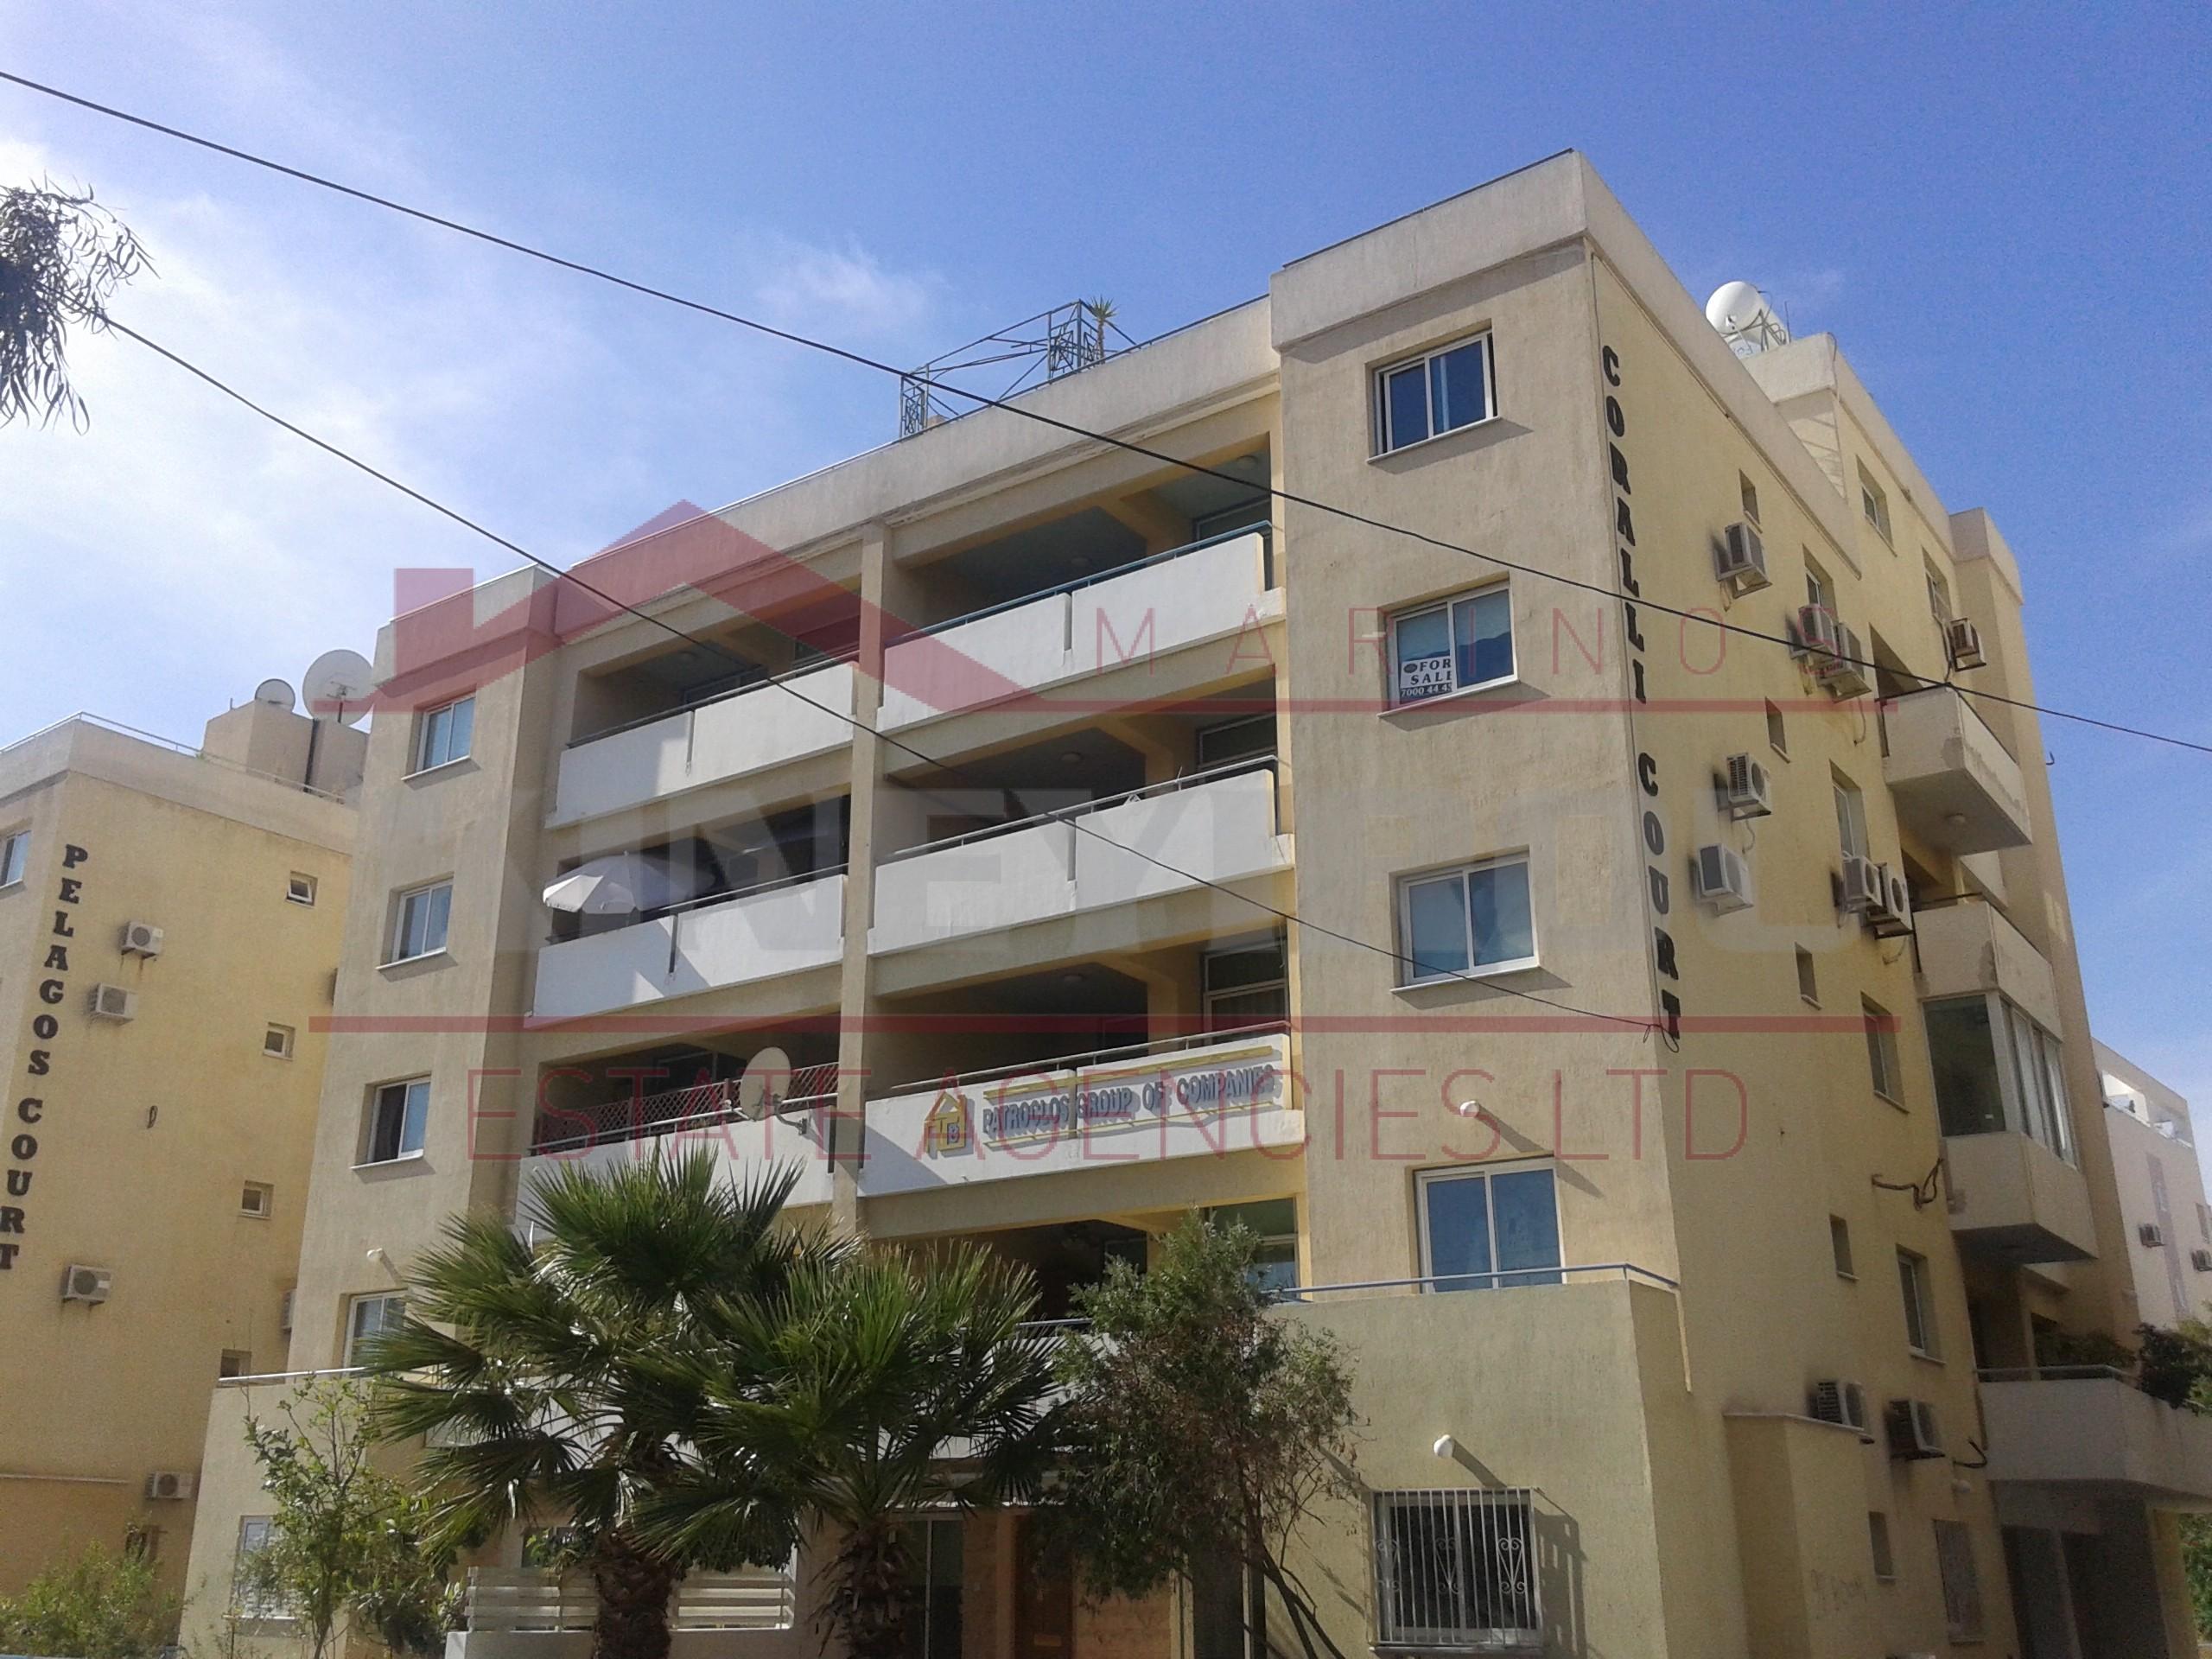 3 Bedroom Apartment For Sale In Makenzy Larnaca Cyprus Properties Marinos Kineyirou